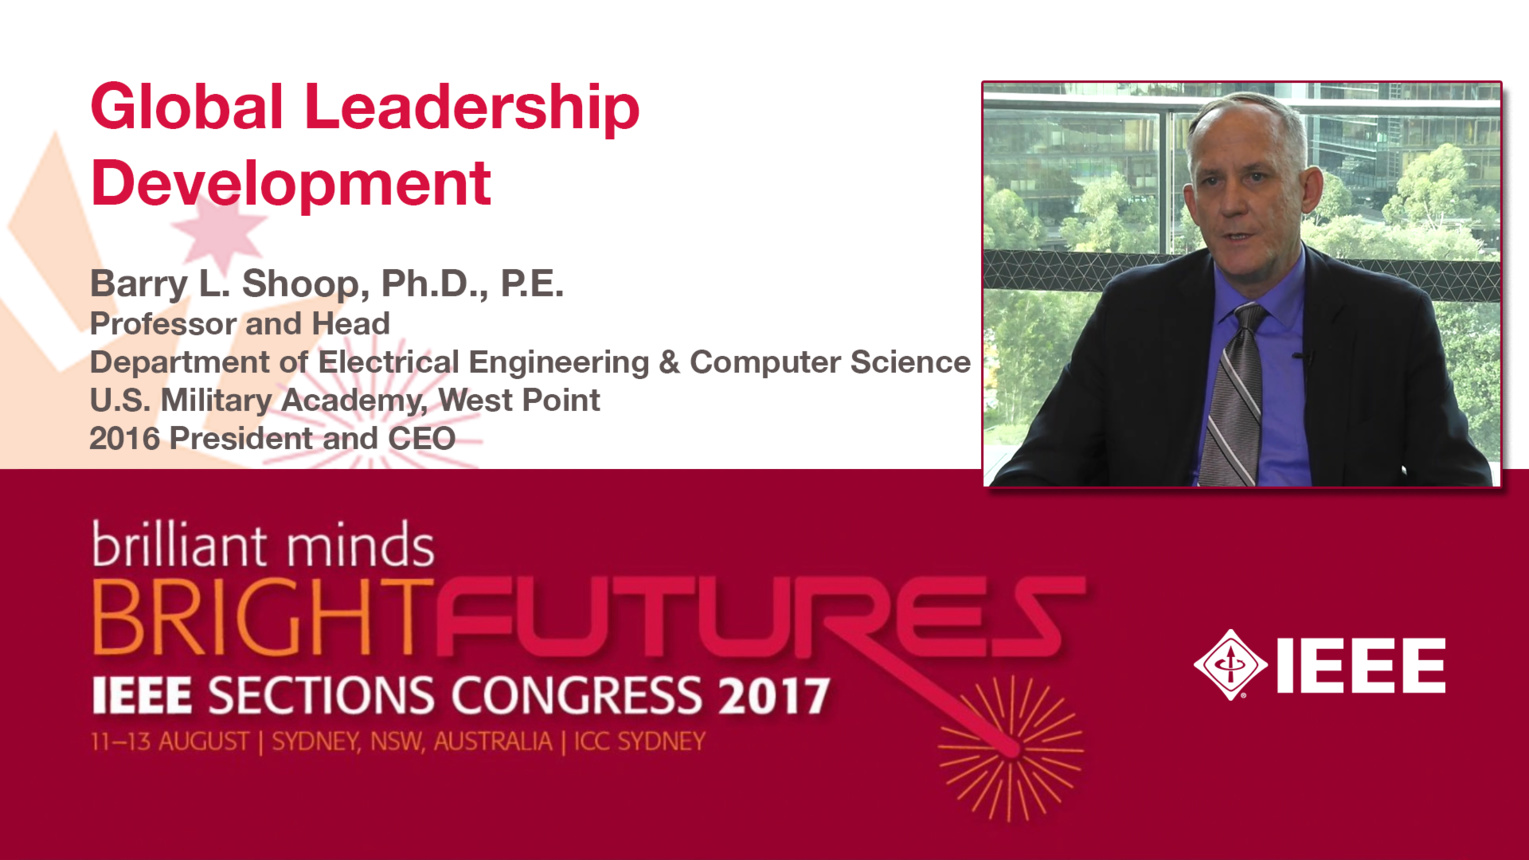 Barry Shoop: Global Leadership Development - Studio Tech Talks: Sections Congress 2017